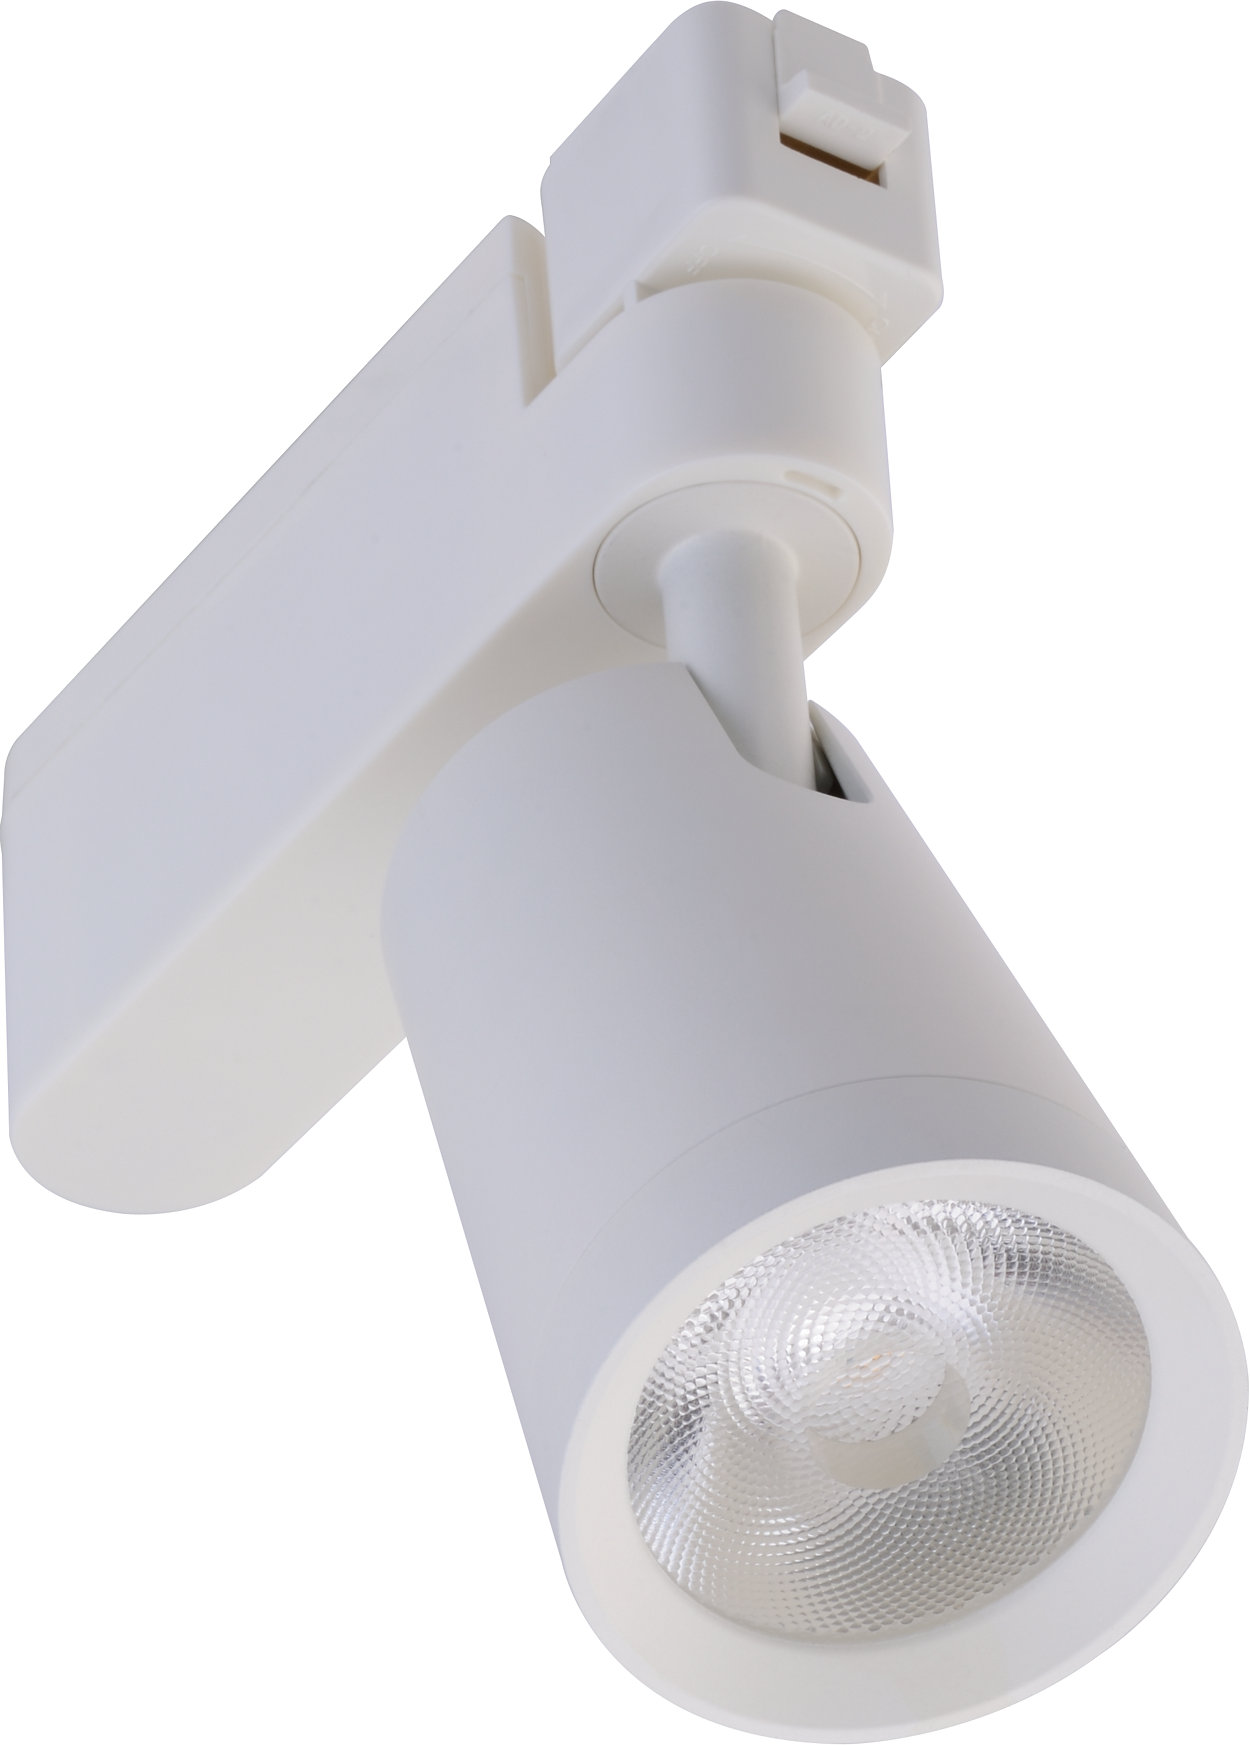 FlexAccent G2: calidad de luz excelente